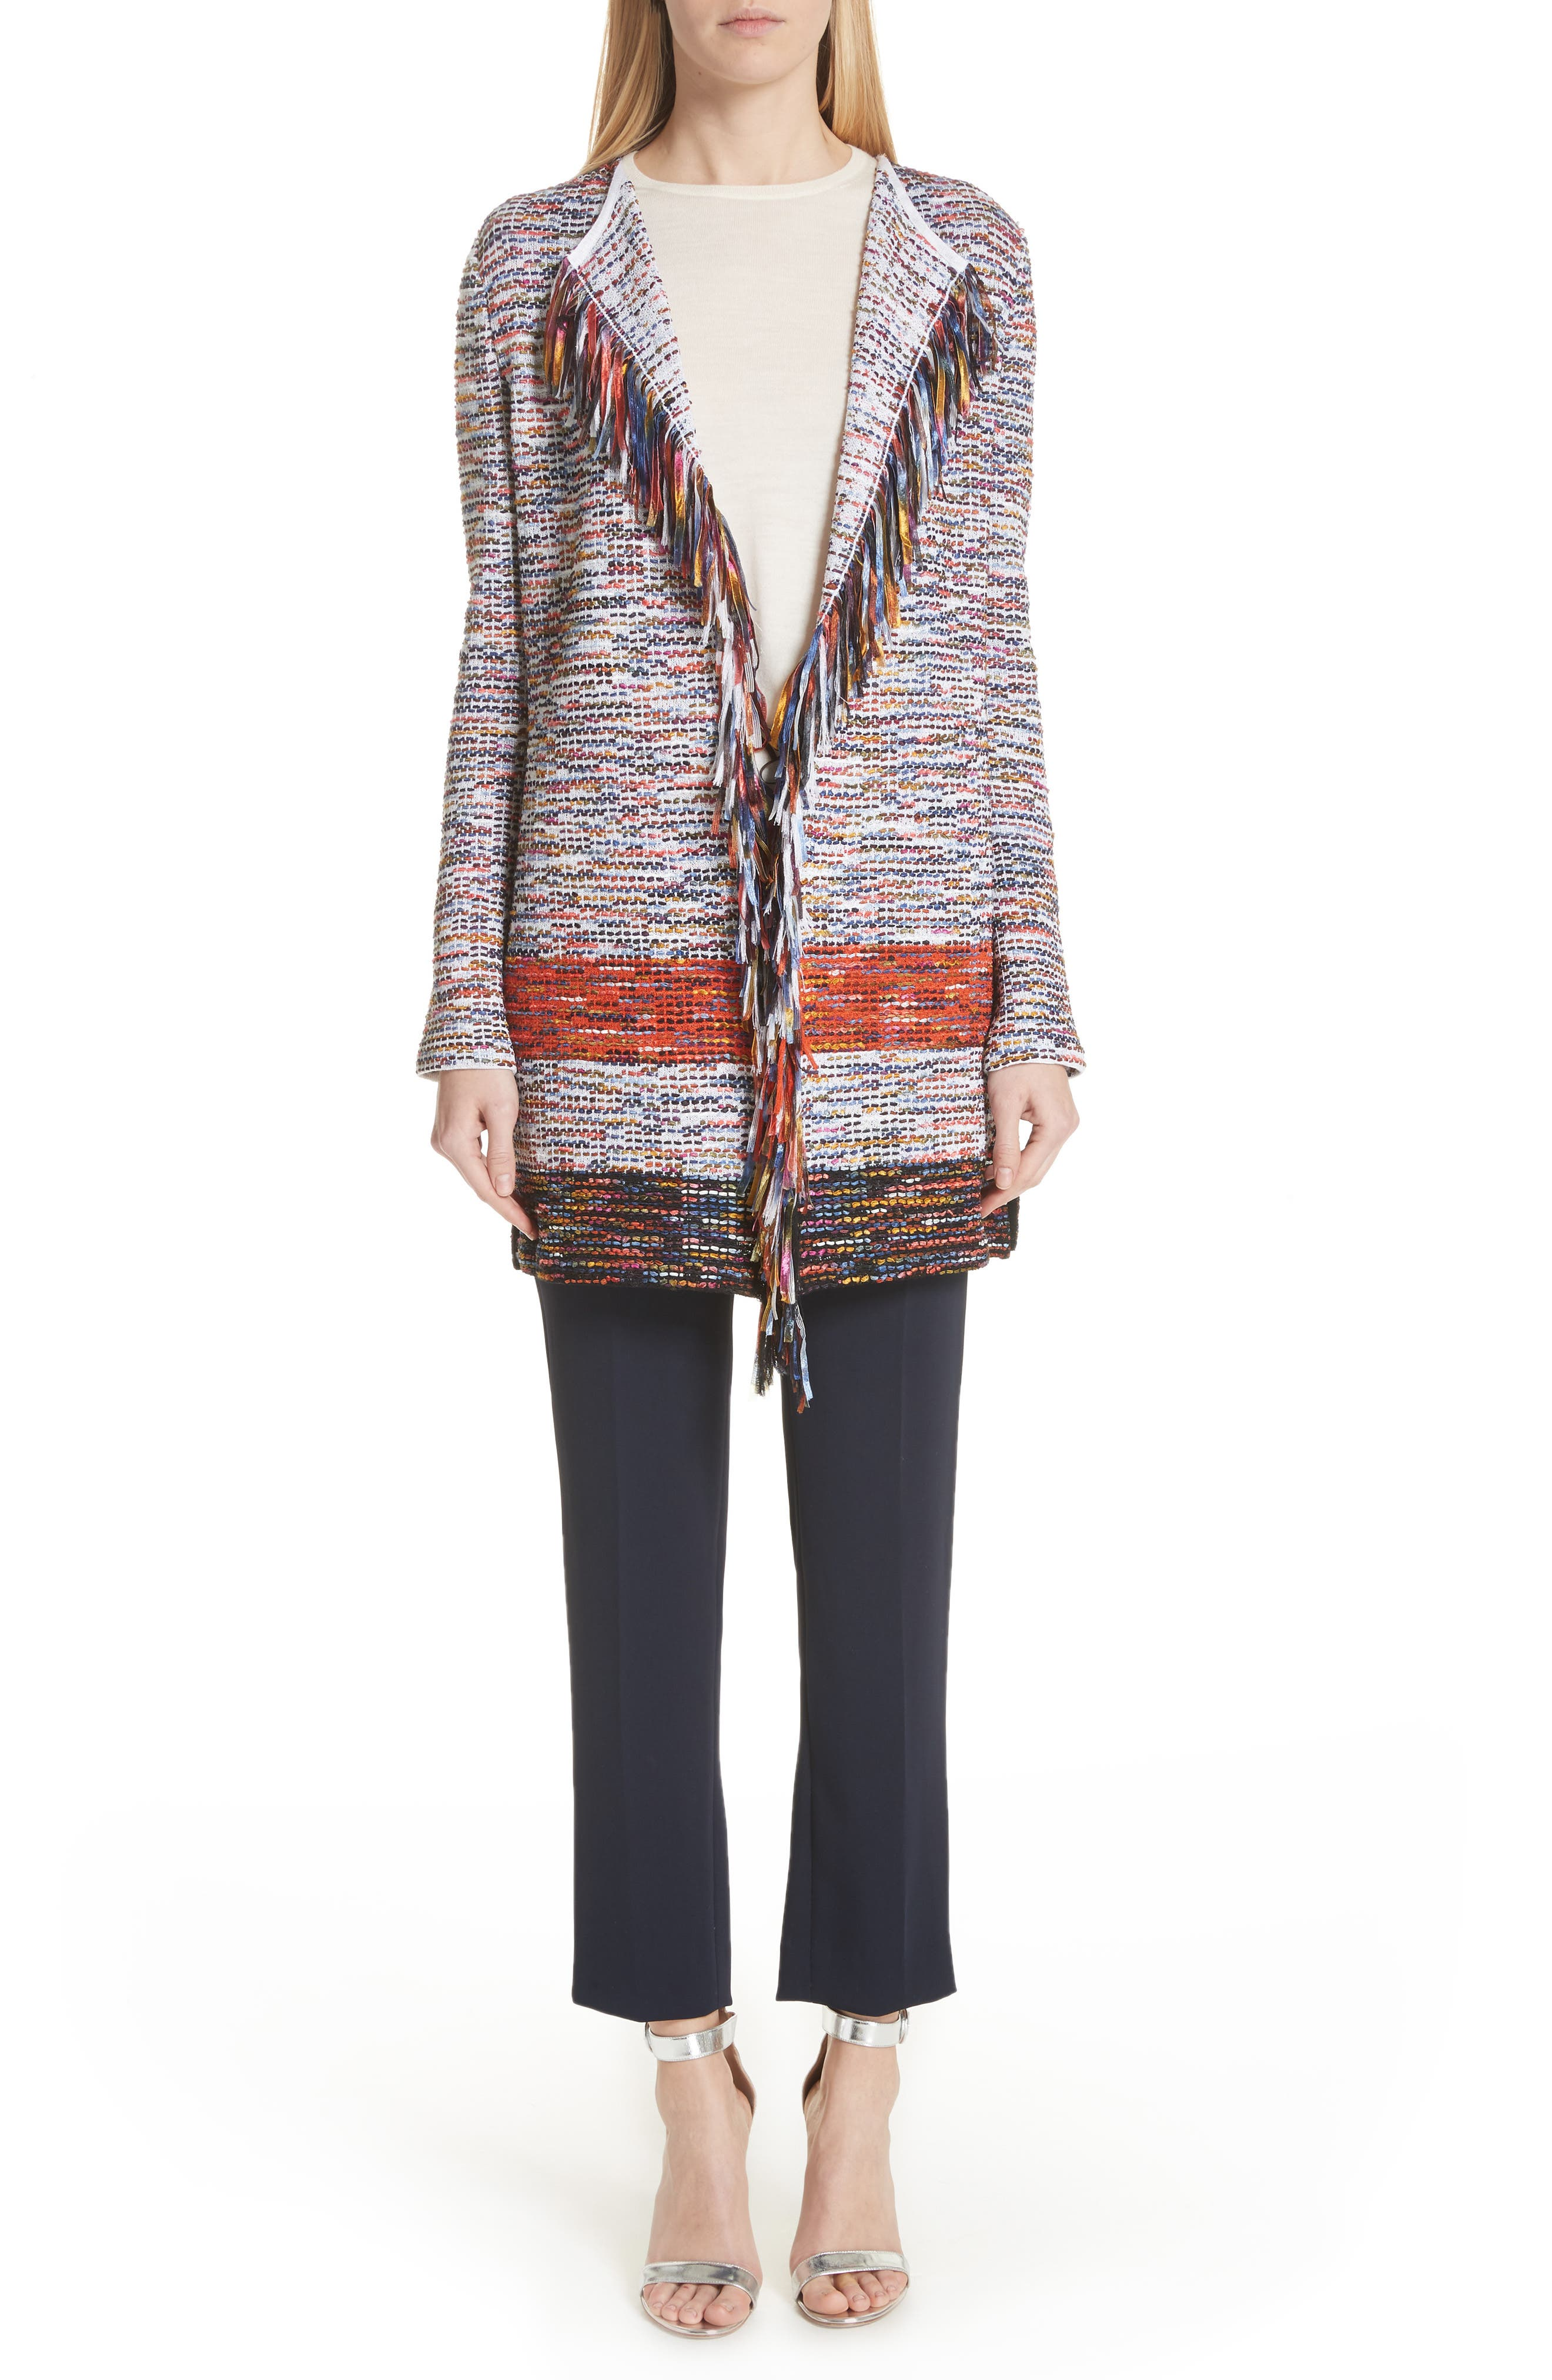 Vertical Fringe Multi Tweed Knit Waterfall Cardigan,                             Alternate thumbnail 8, color,                             SIENNA MULTI